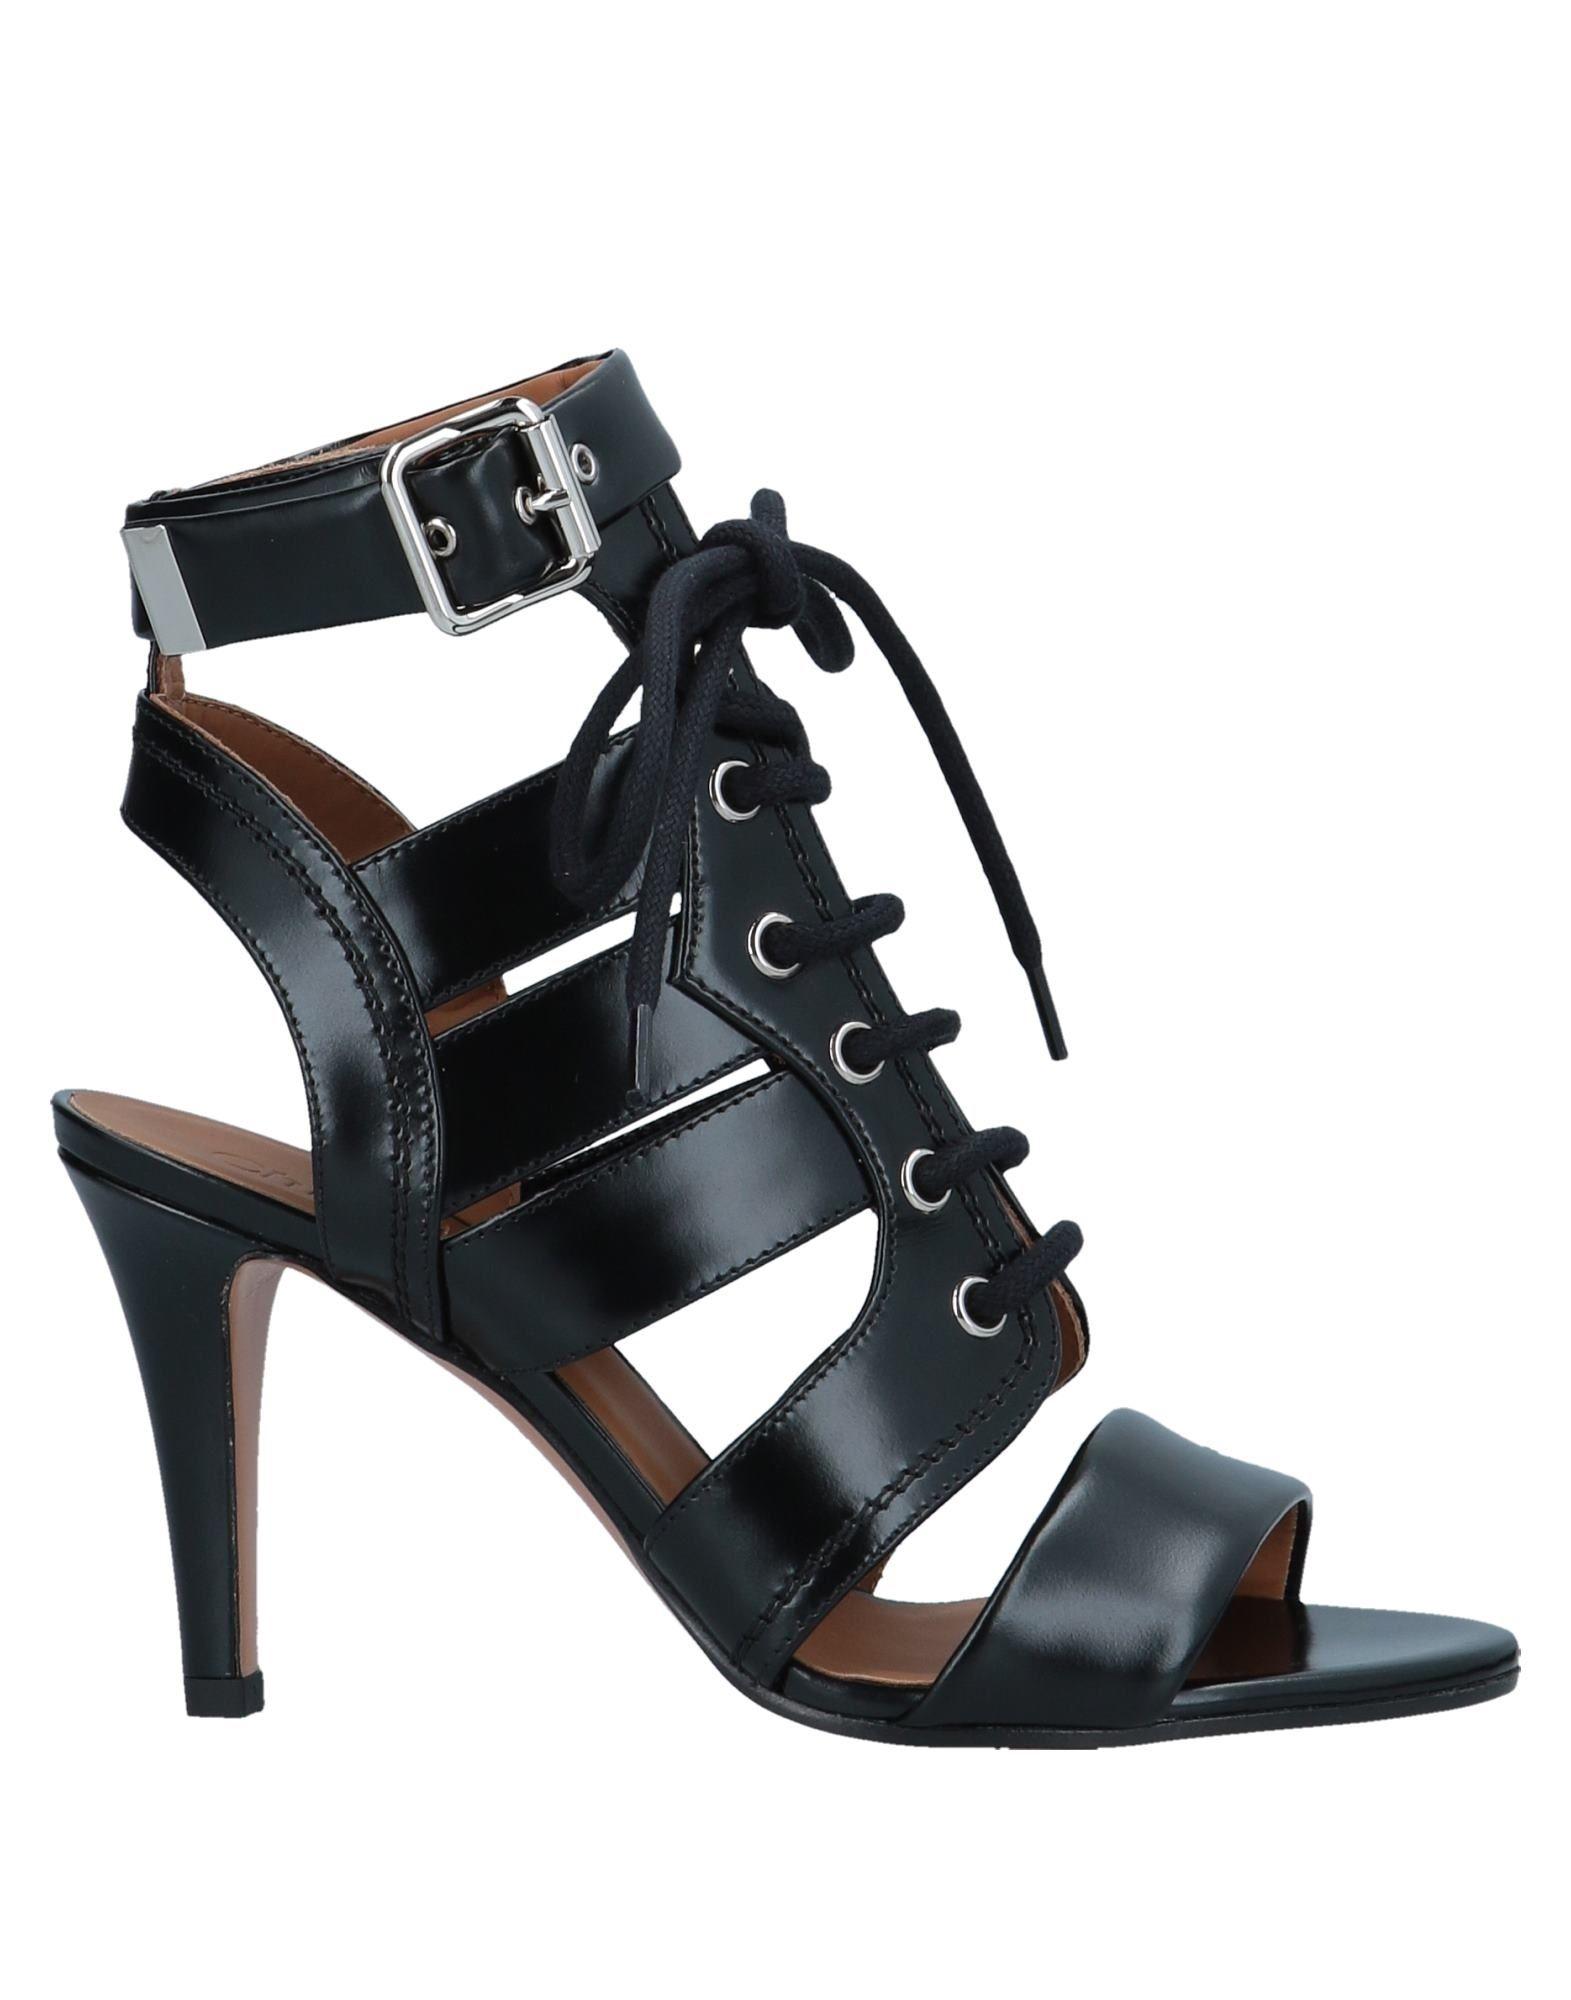 CHLOÉ Босоножки на каблуке босоножки на каблуке с ремешком вокруг щиколотки giselle